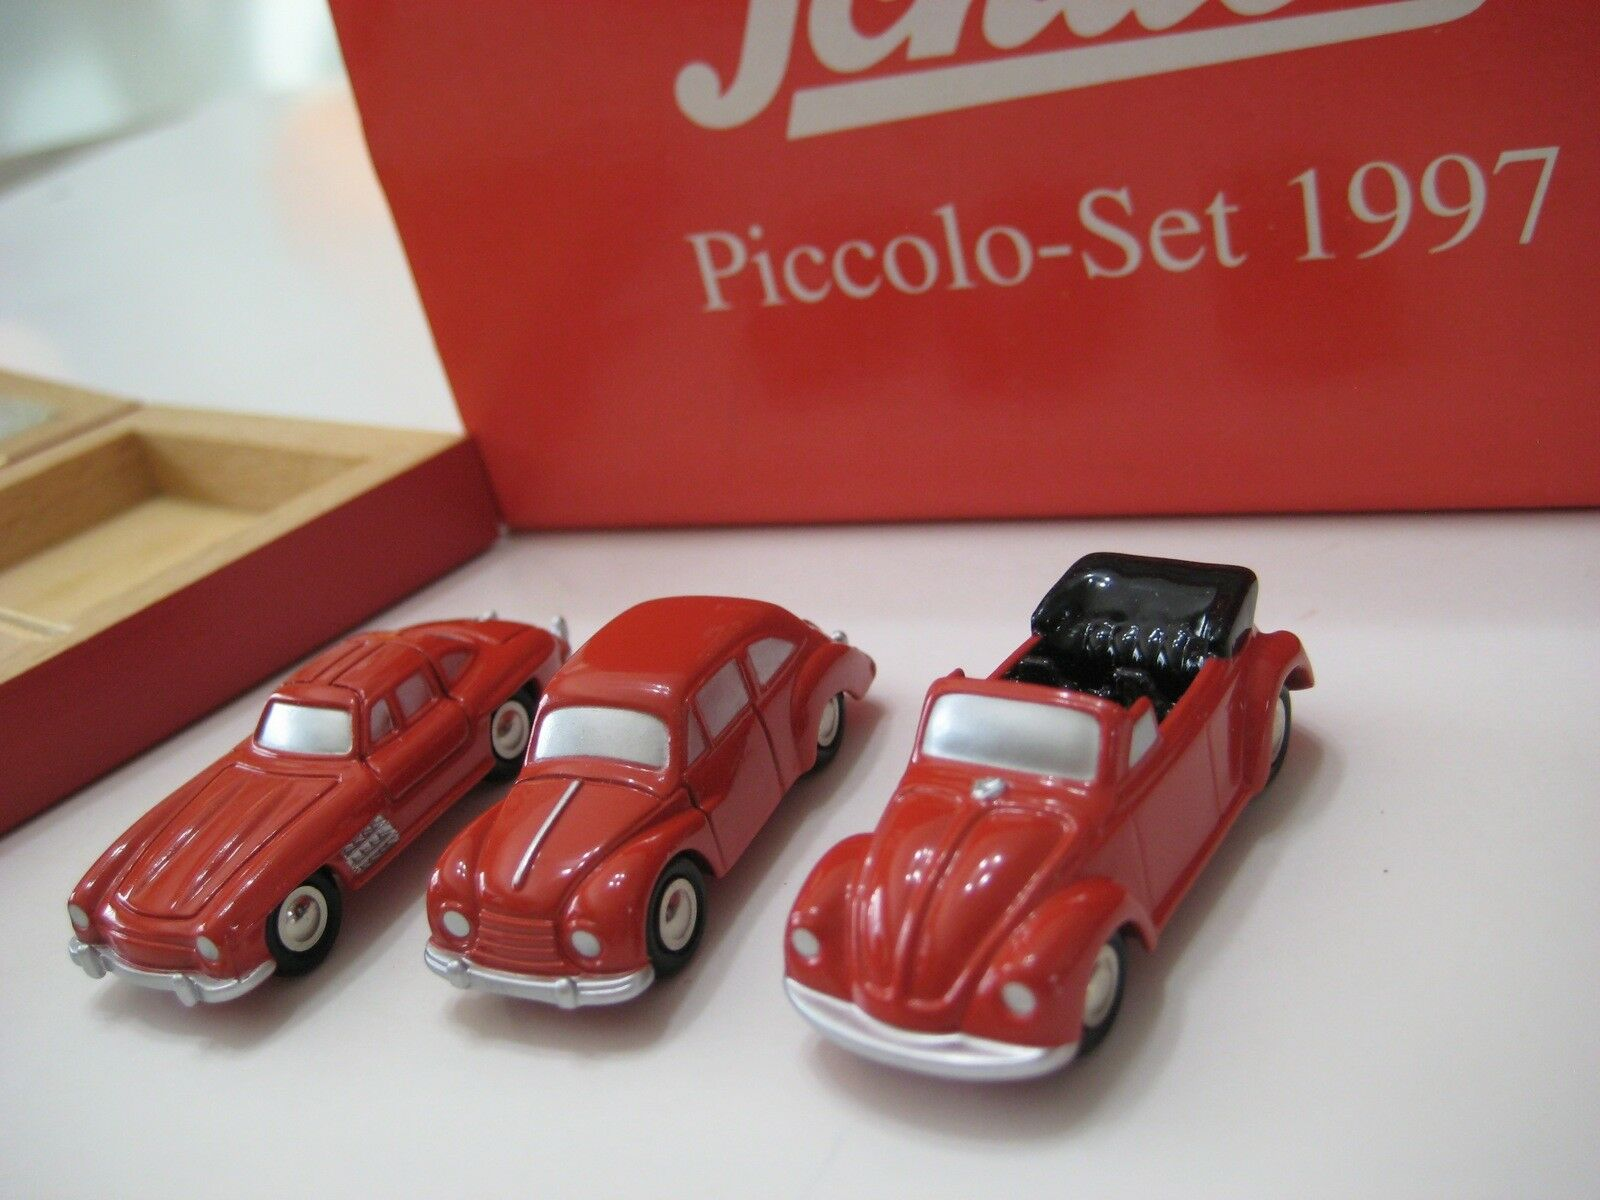 Schuco Piccolo-Set 1997 (Germany) rot Volkswagen, DKW & Mercedes-Benz 1 90 NIB